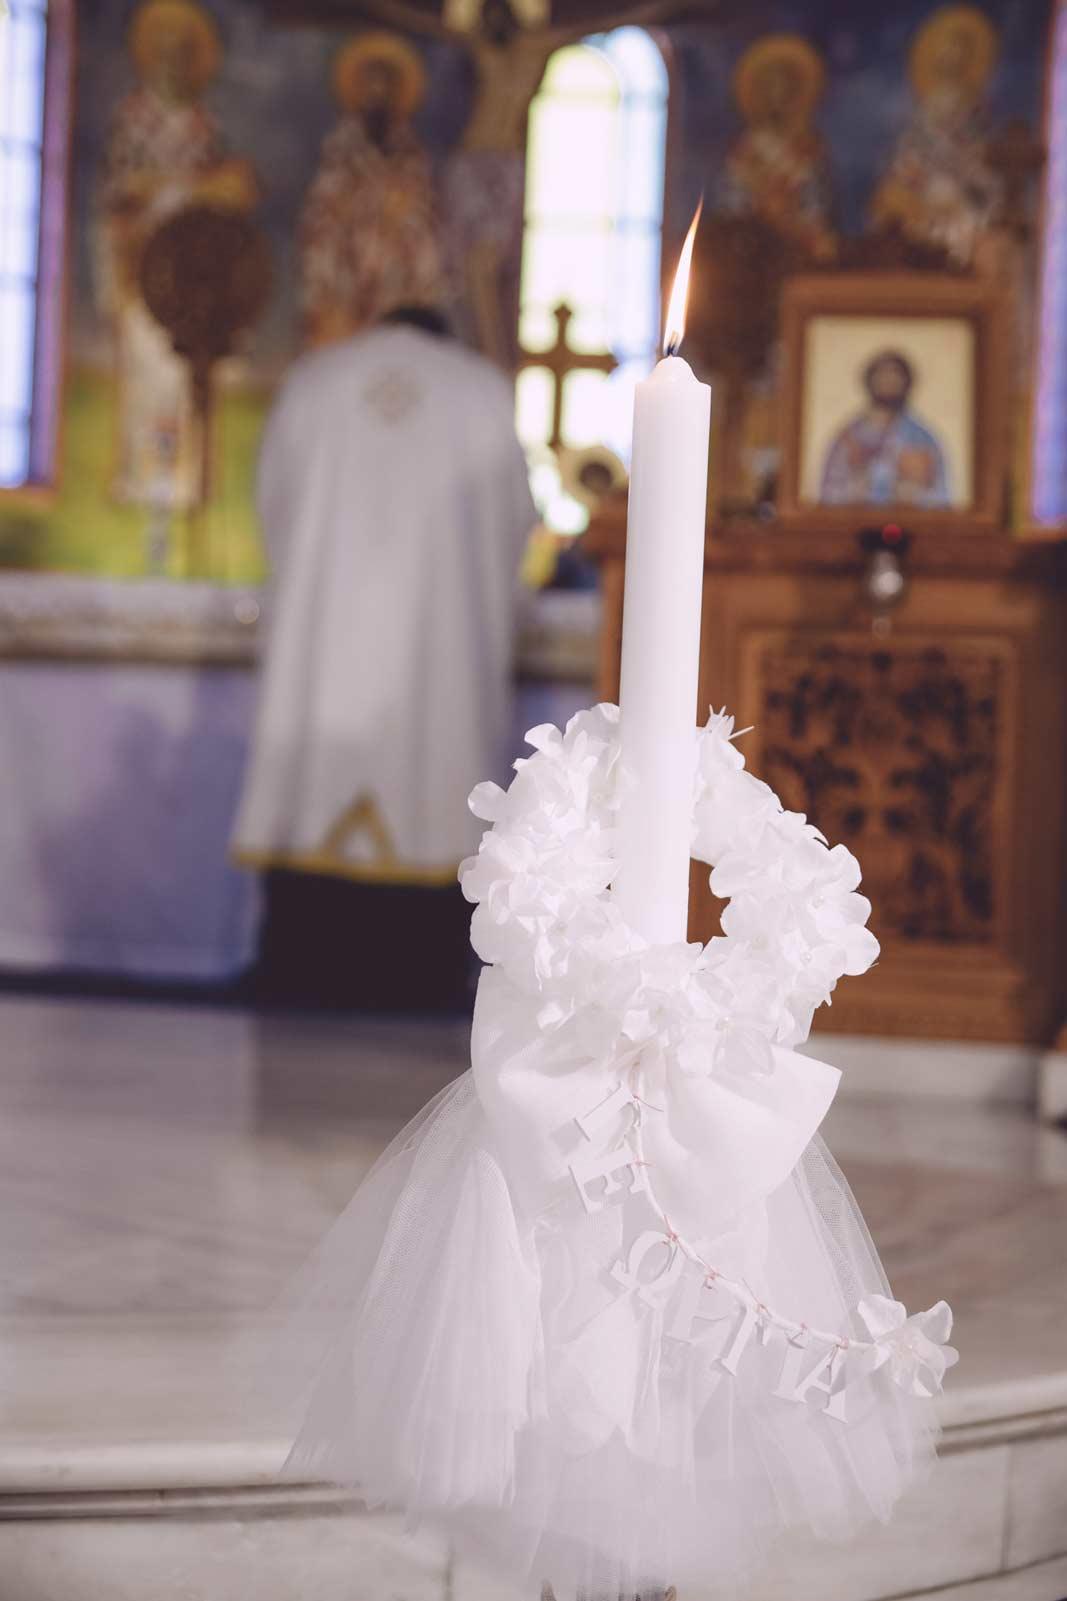 322 PhotoVaptisis βαπτιση βουλα αγιος νεκταριος vaptisi fotografos moro mama nona 016 PhotoVaptisis